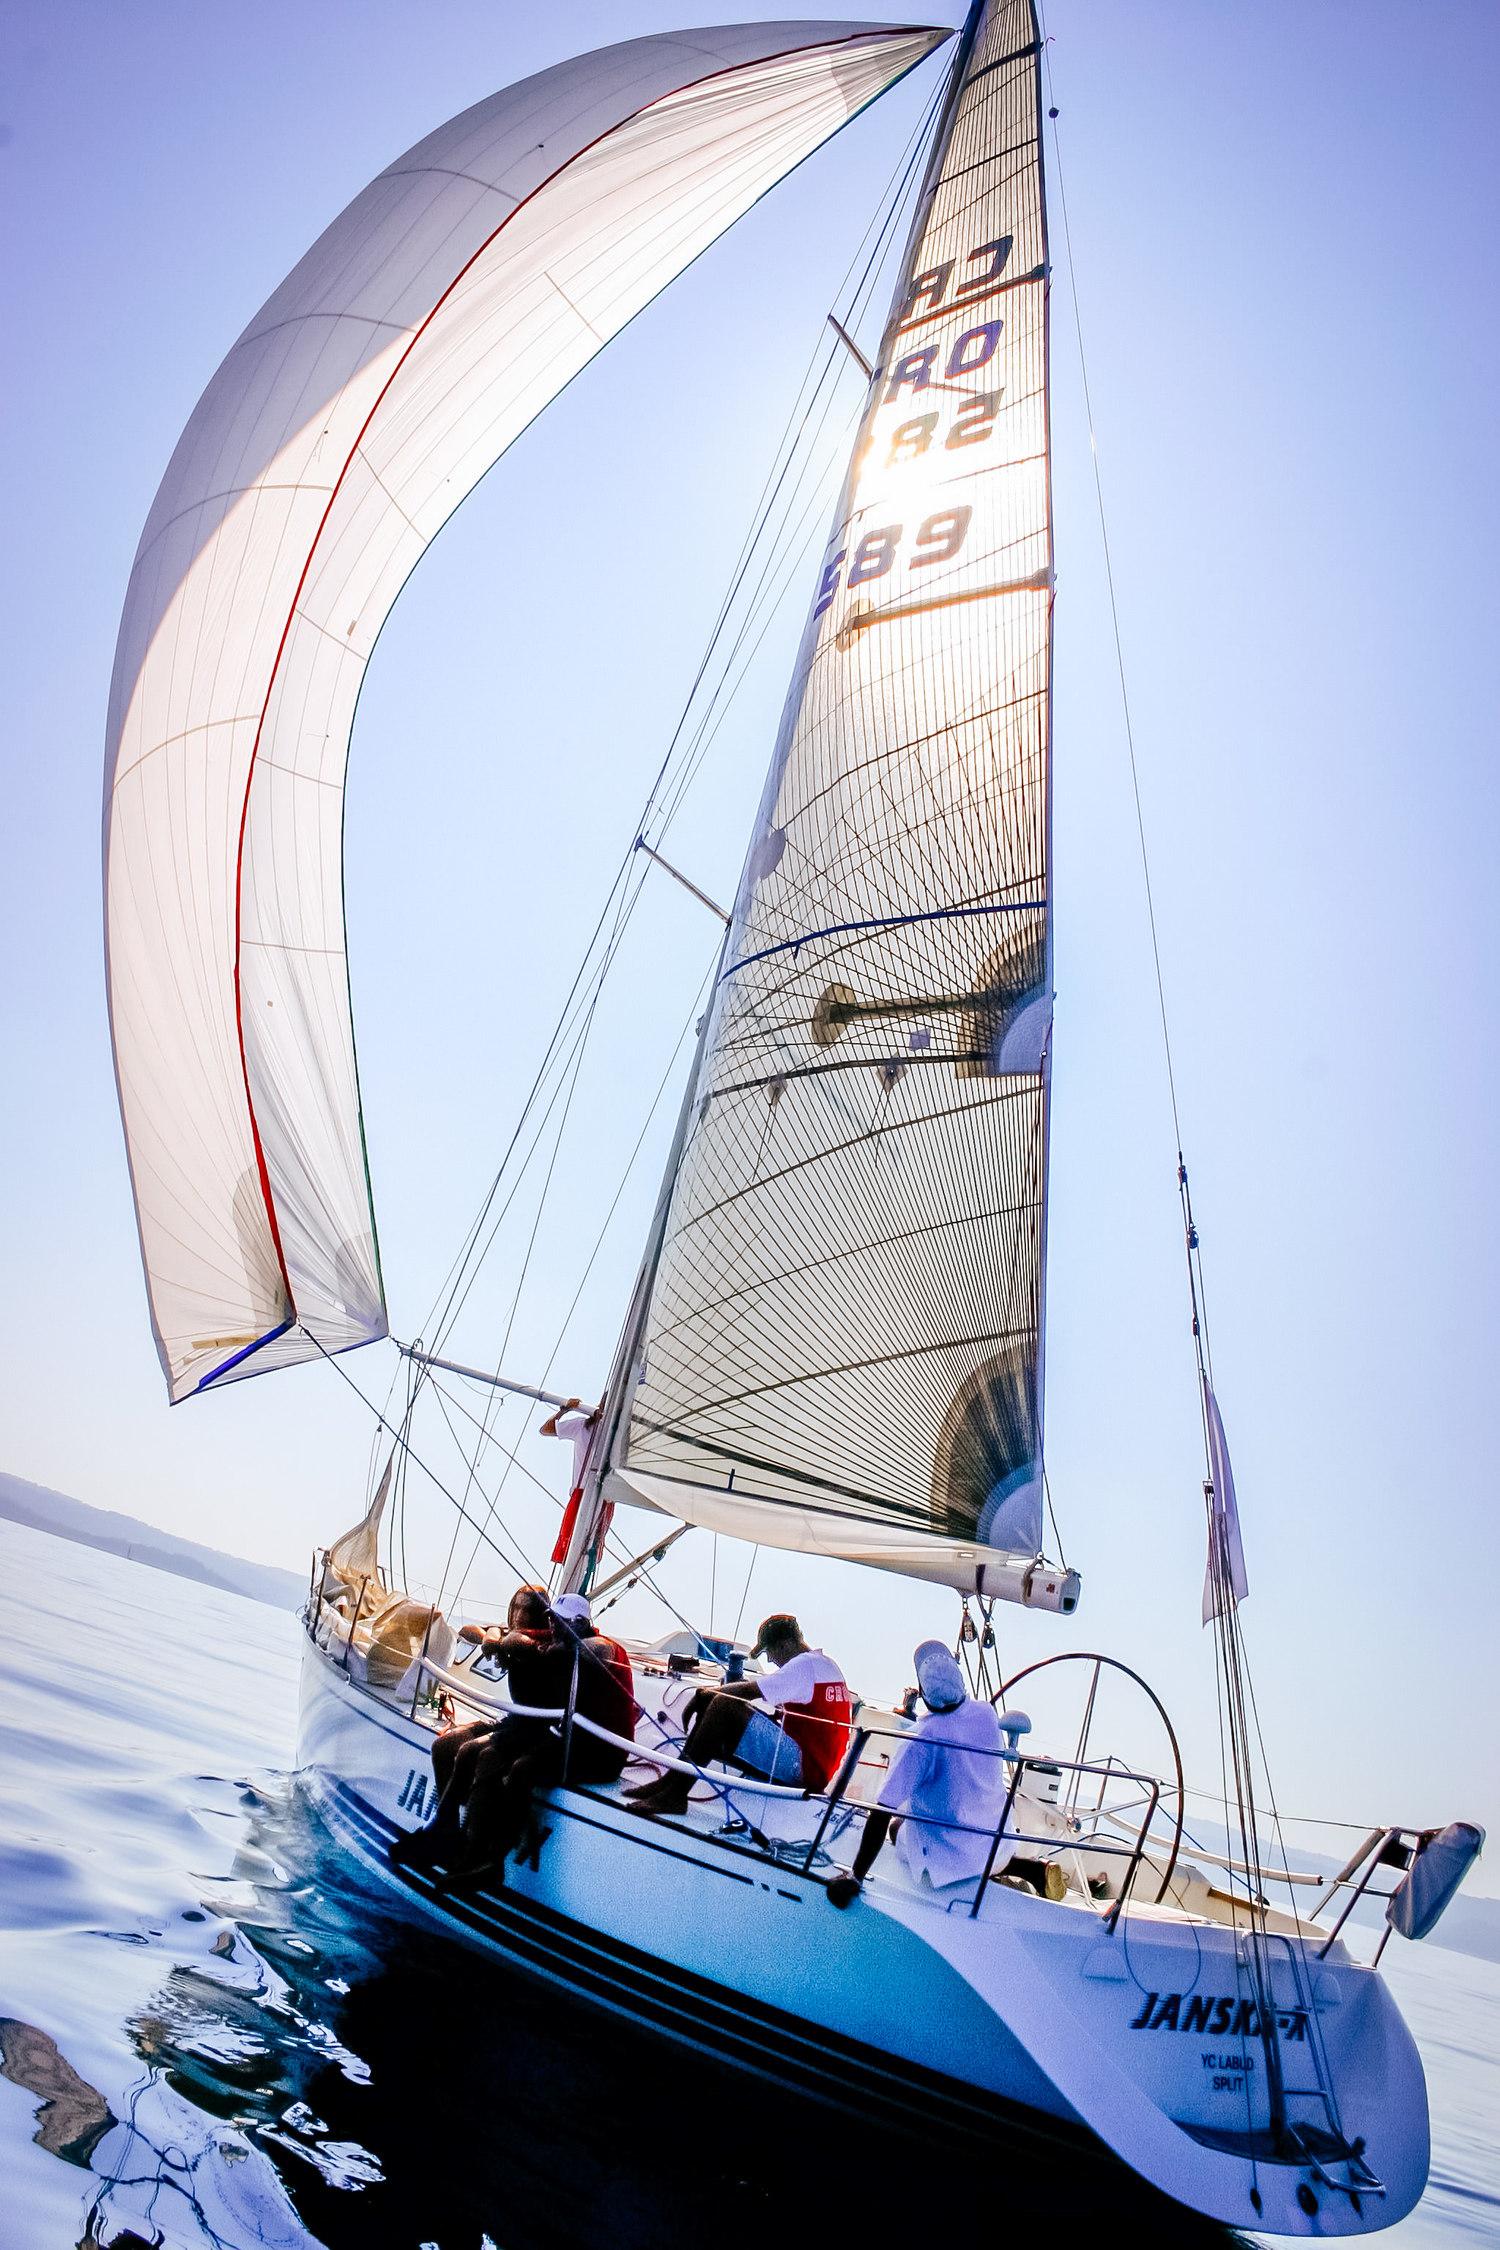 UK+Sailmakers+S1+Spinnaker-2.jpeg